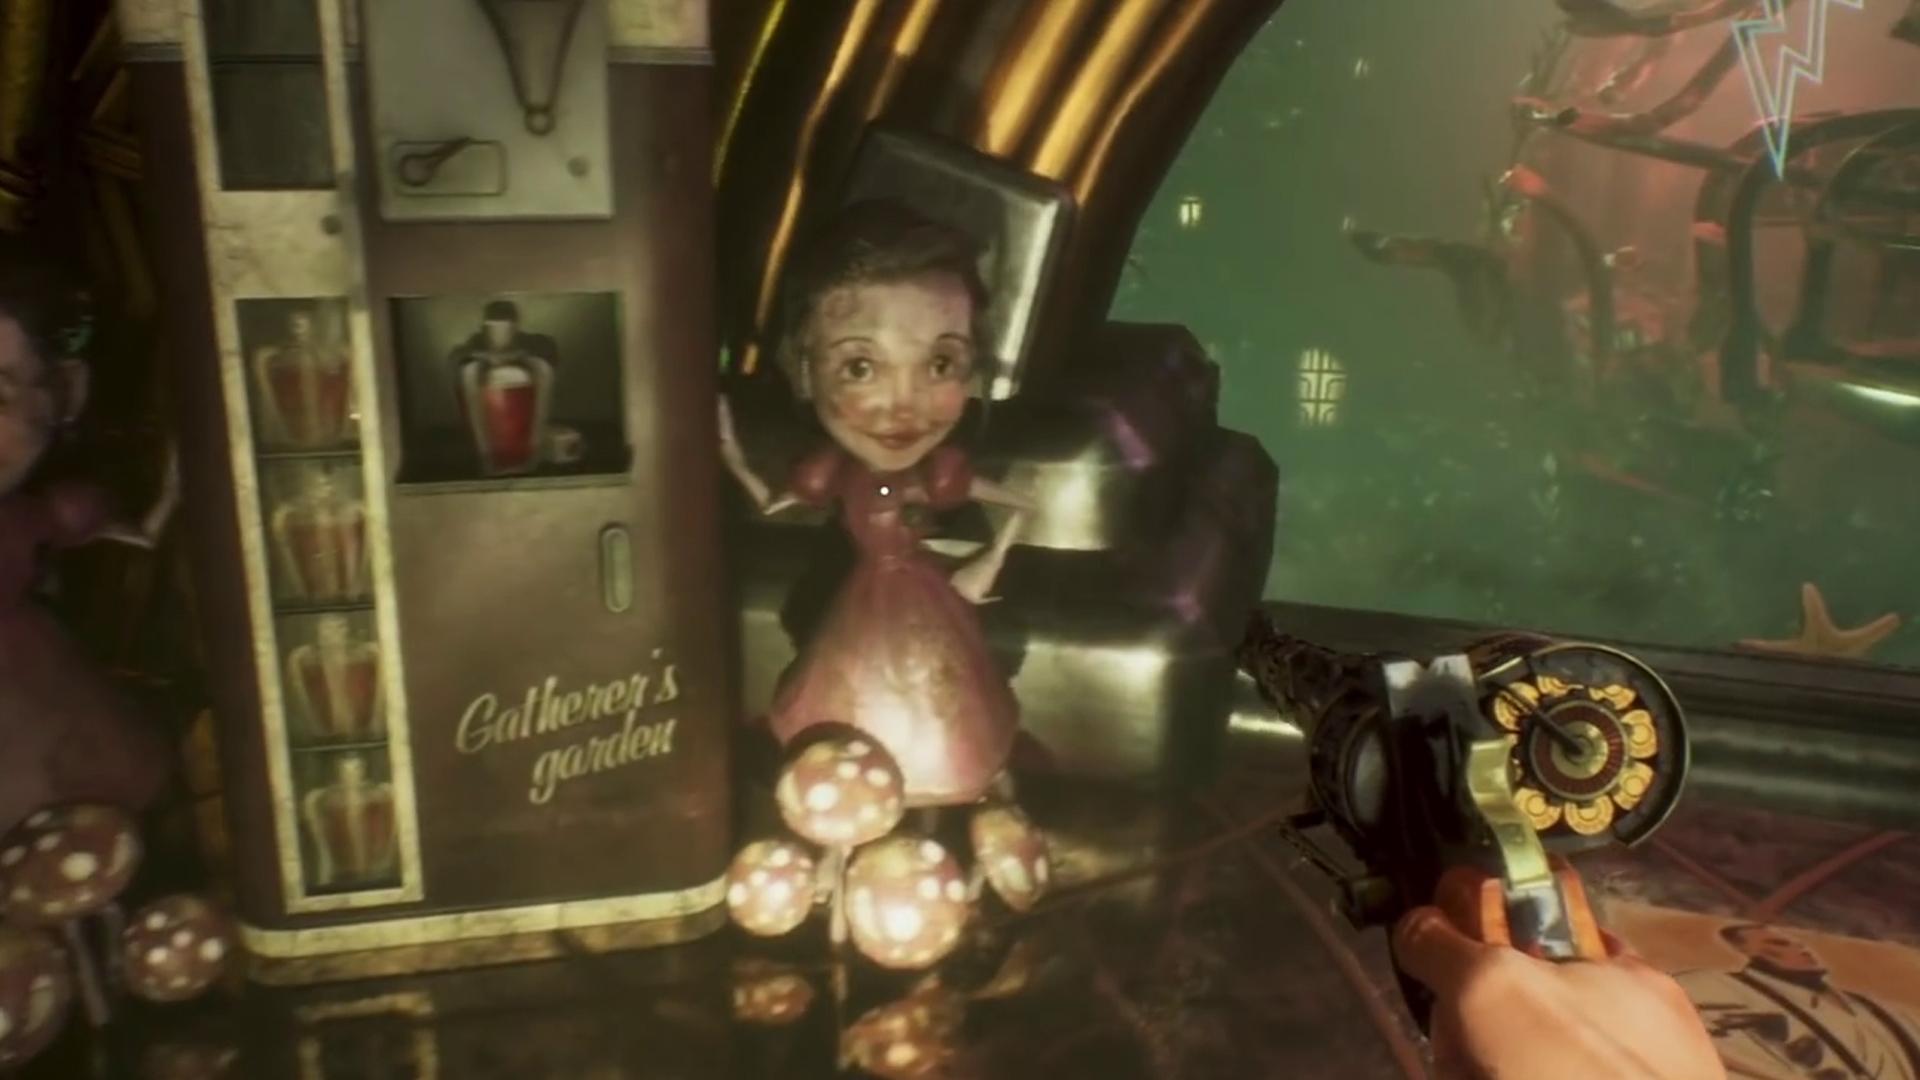 Here's what BioShock looks like in Unreal Engine 5